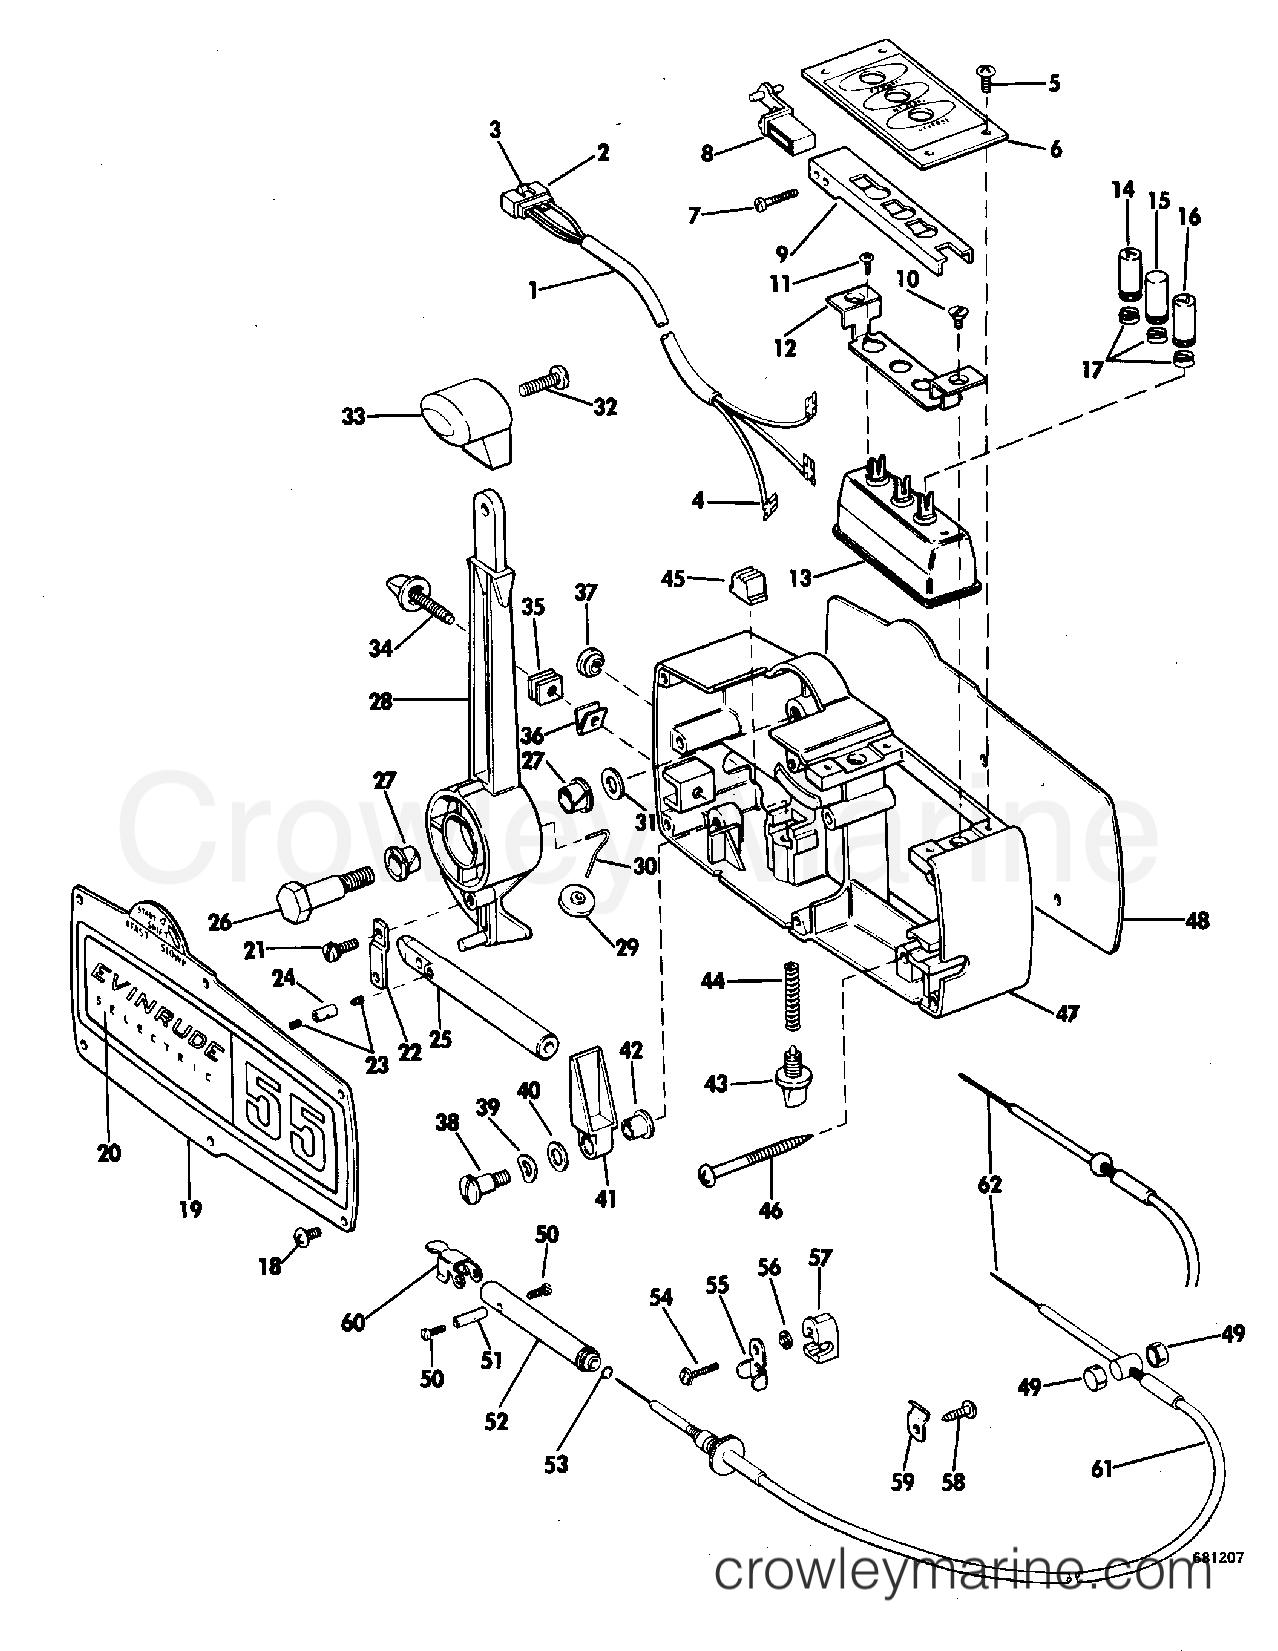 Push Switch Schematic